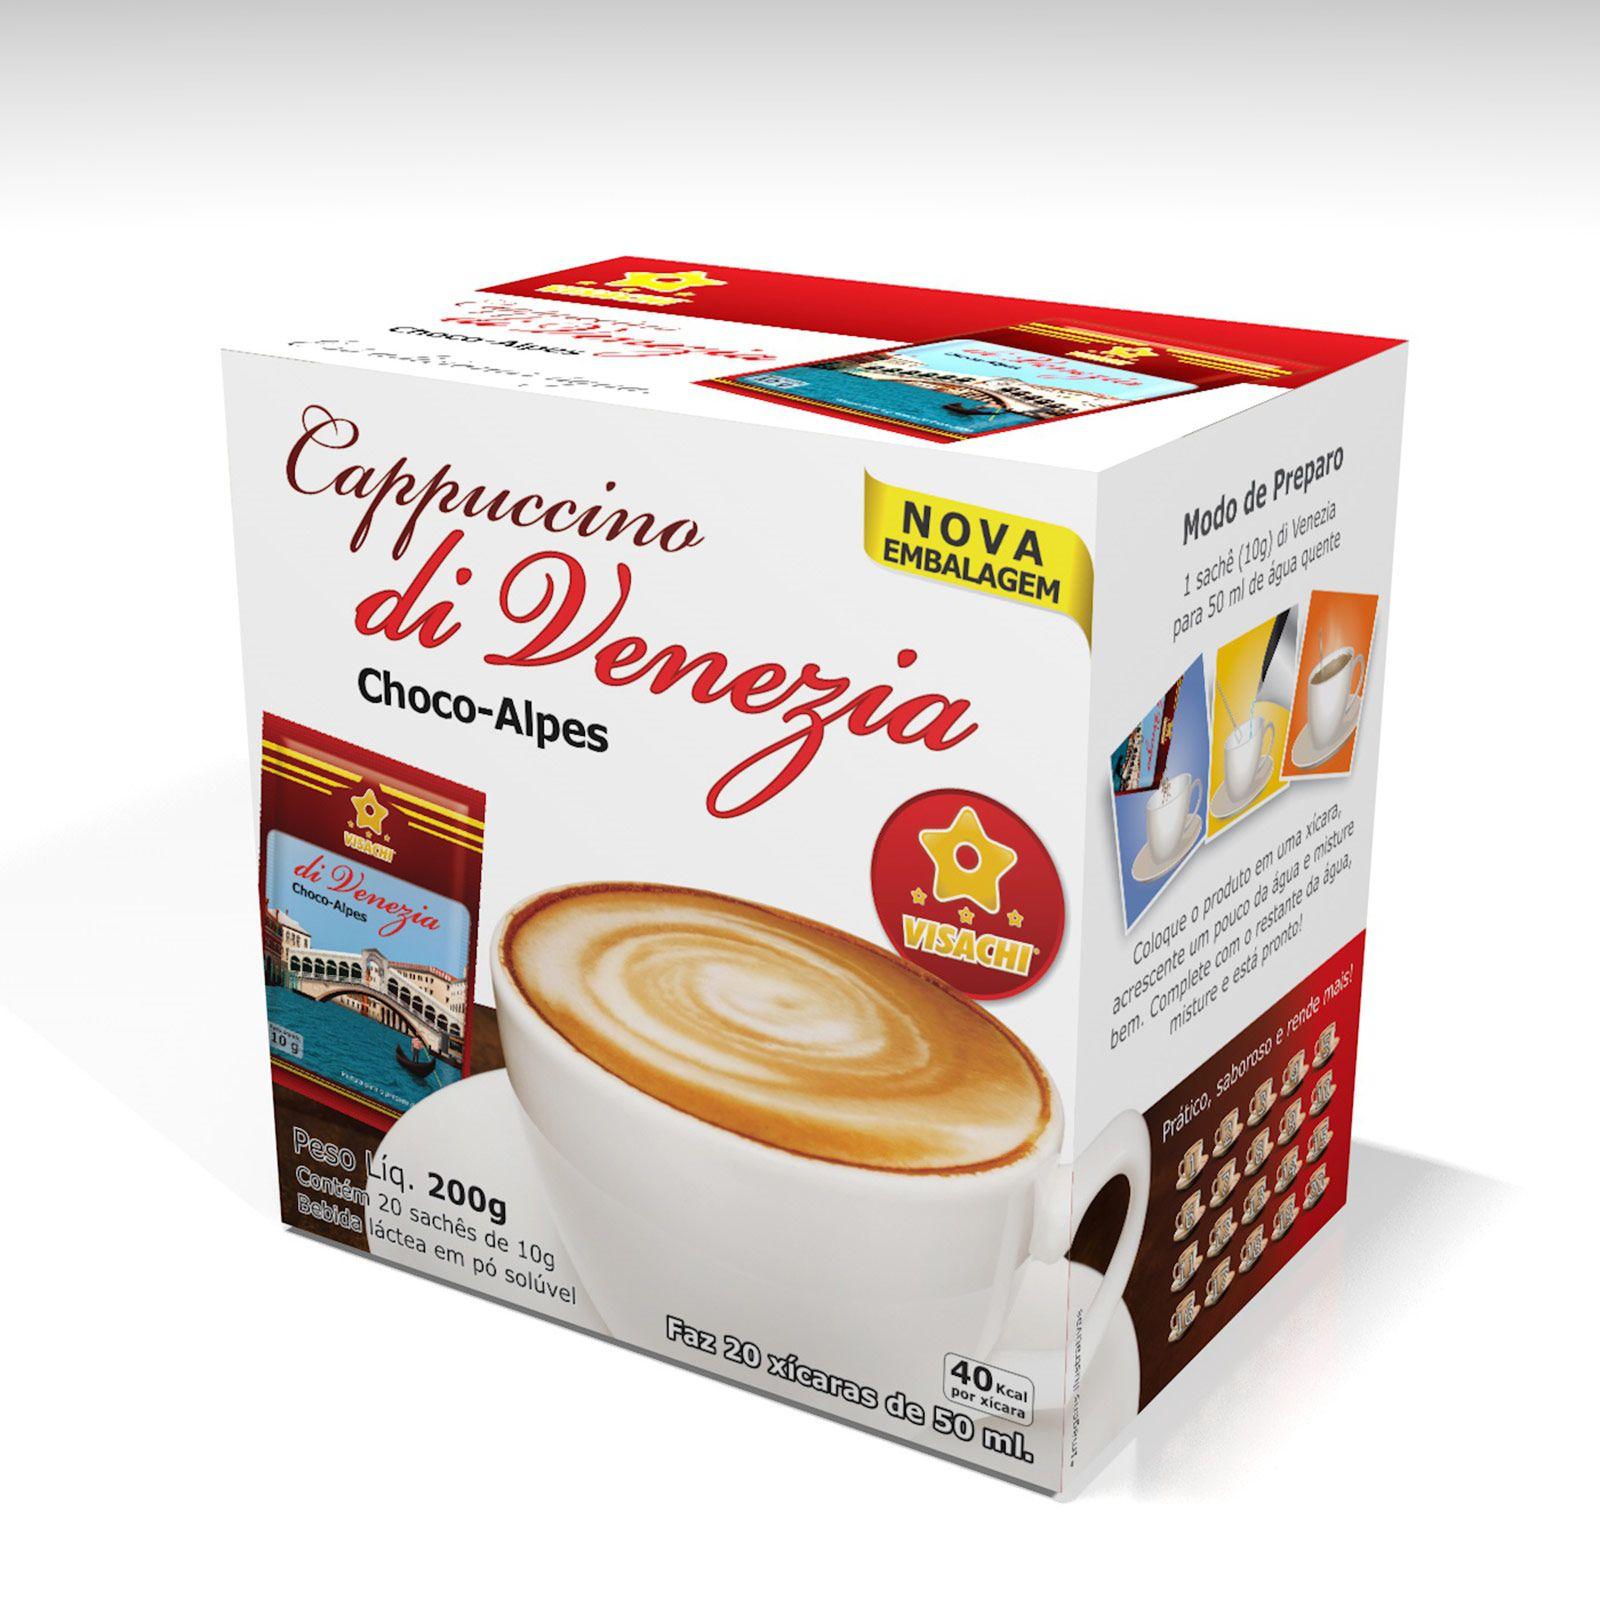 Mini Box Cappuccino Choco-Alpes di Venezia Sachês - 20 unidades  - Visachi Alimentos